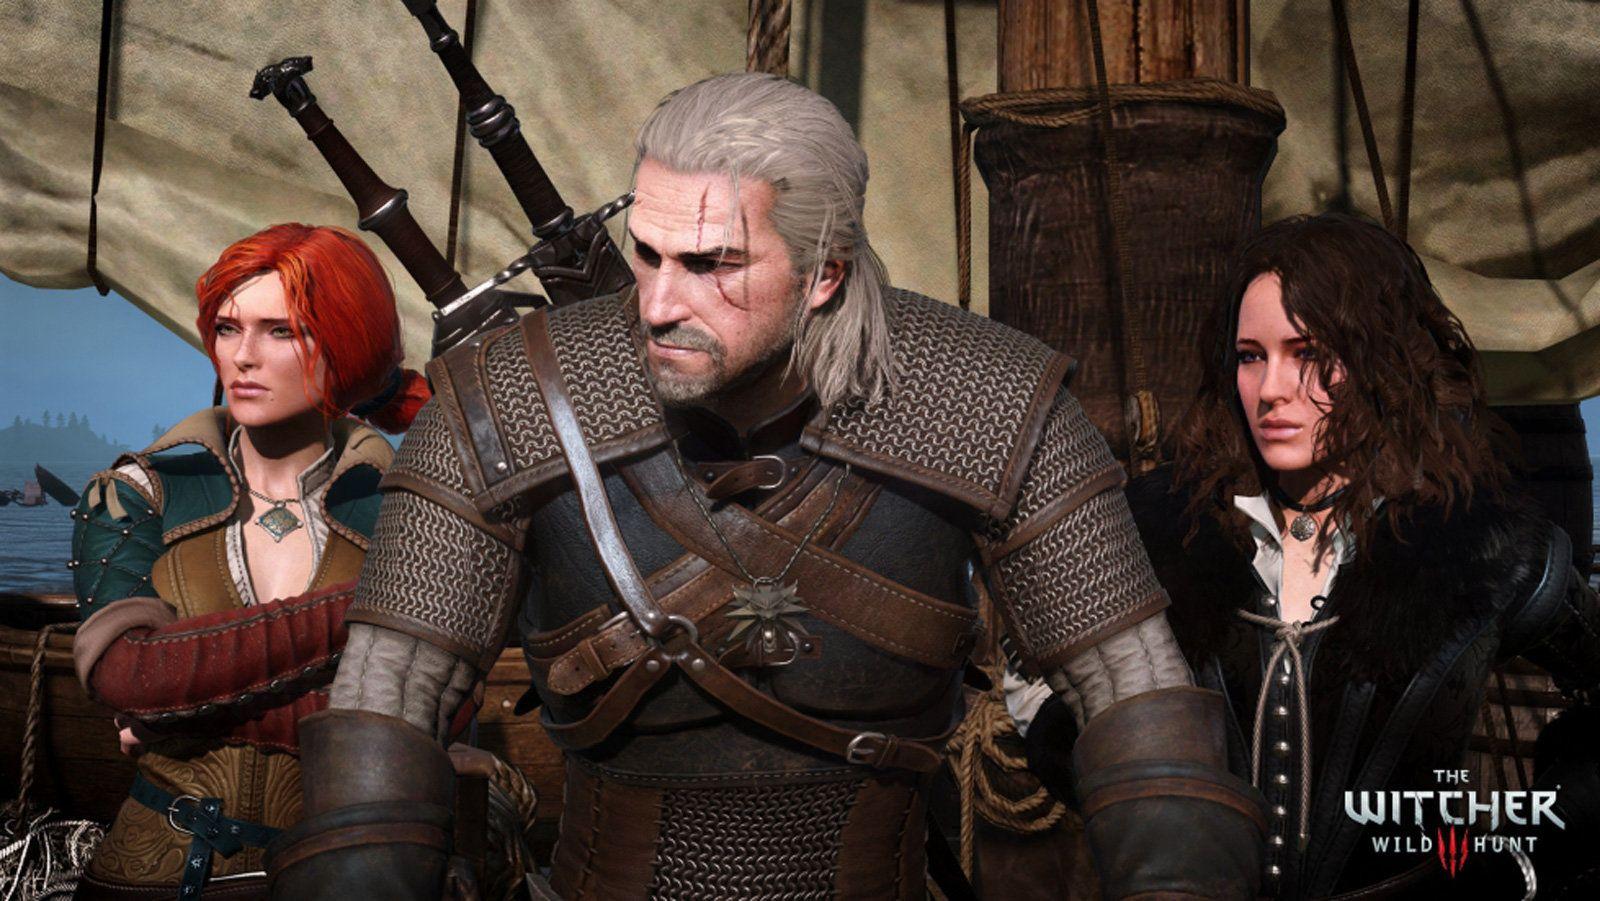 Witcher 3 به اندازه Red Dead Redemption 2 در Steam بازیکن دارد